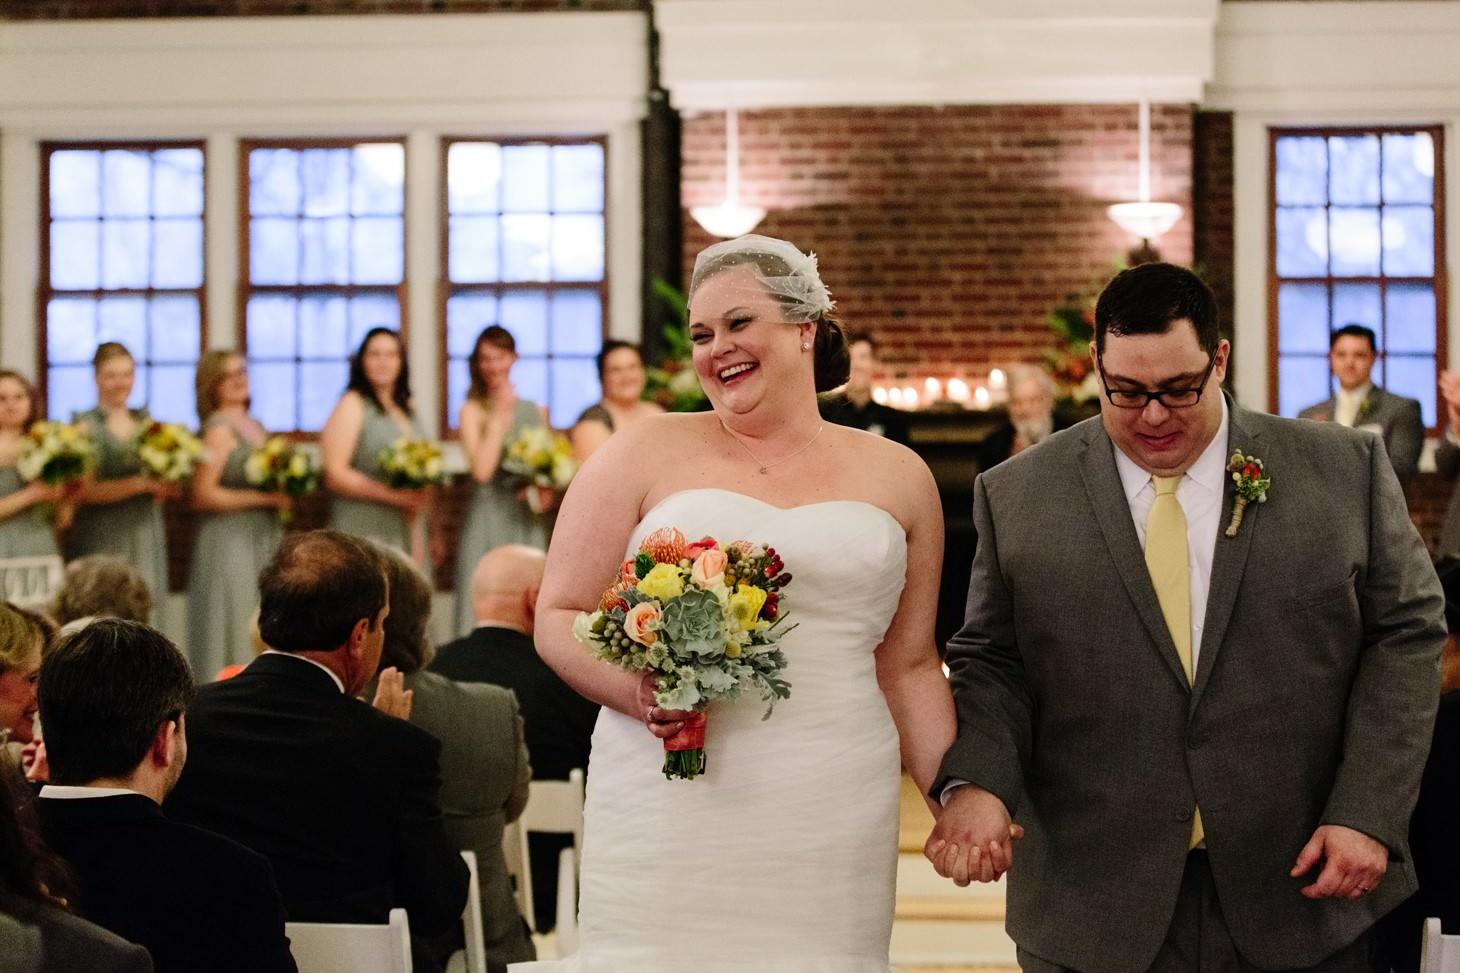 nyc-brooklyn-prospect-park-picnic-house-wedding-smitten-chickens-nerdy-41.jpg